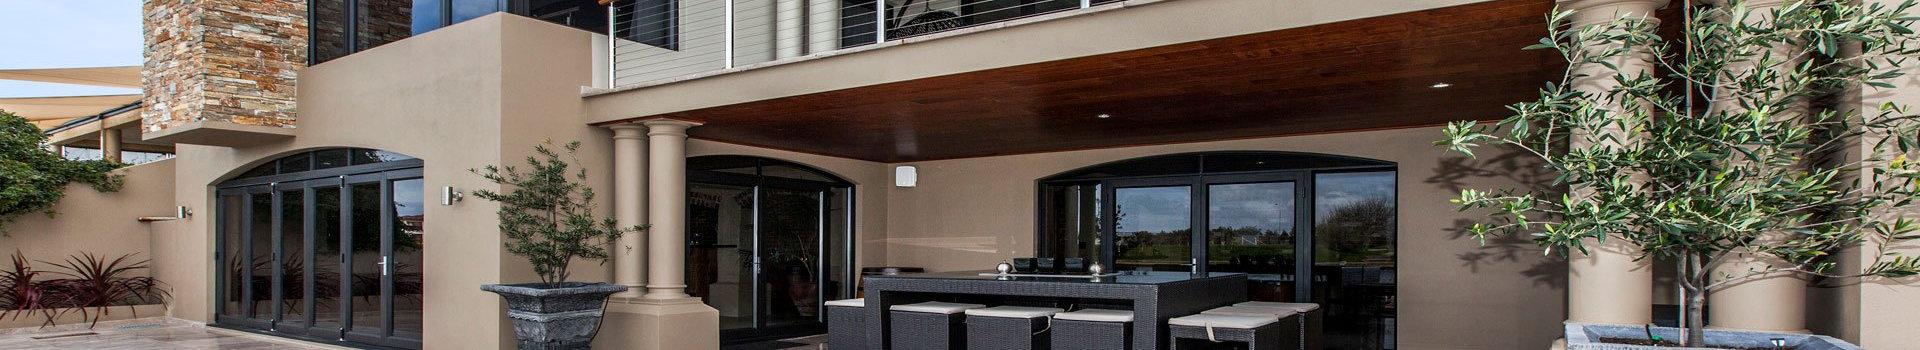 Undercroft Home Designs by Boyd Design Perth